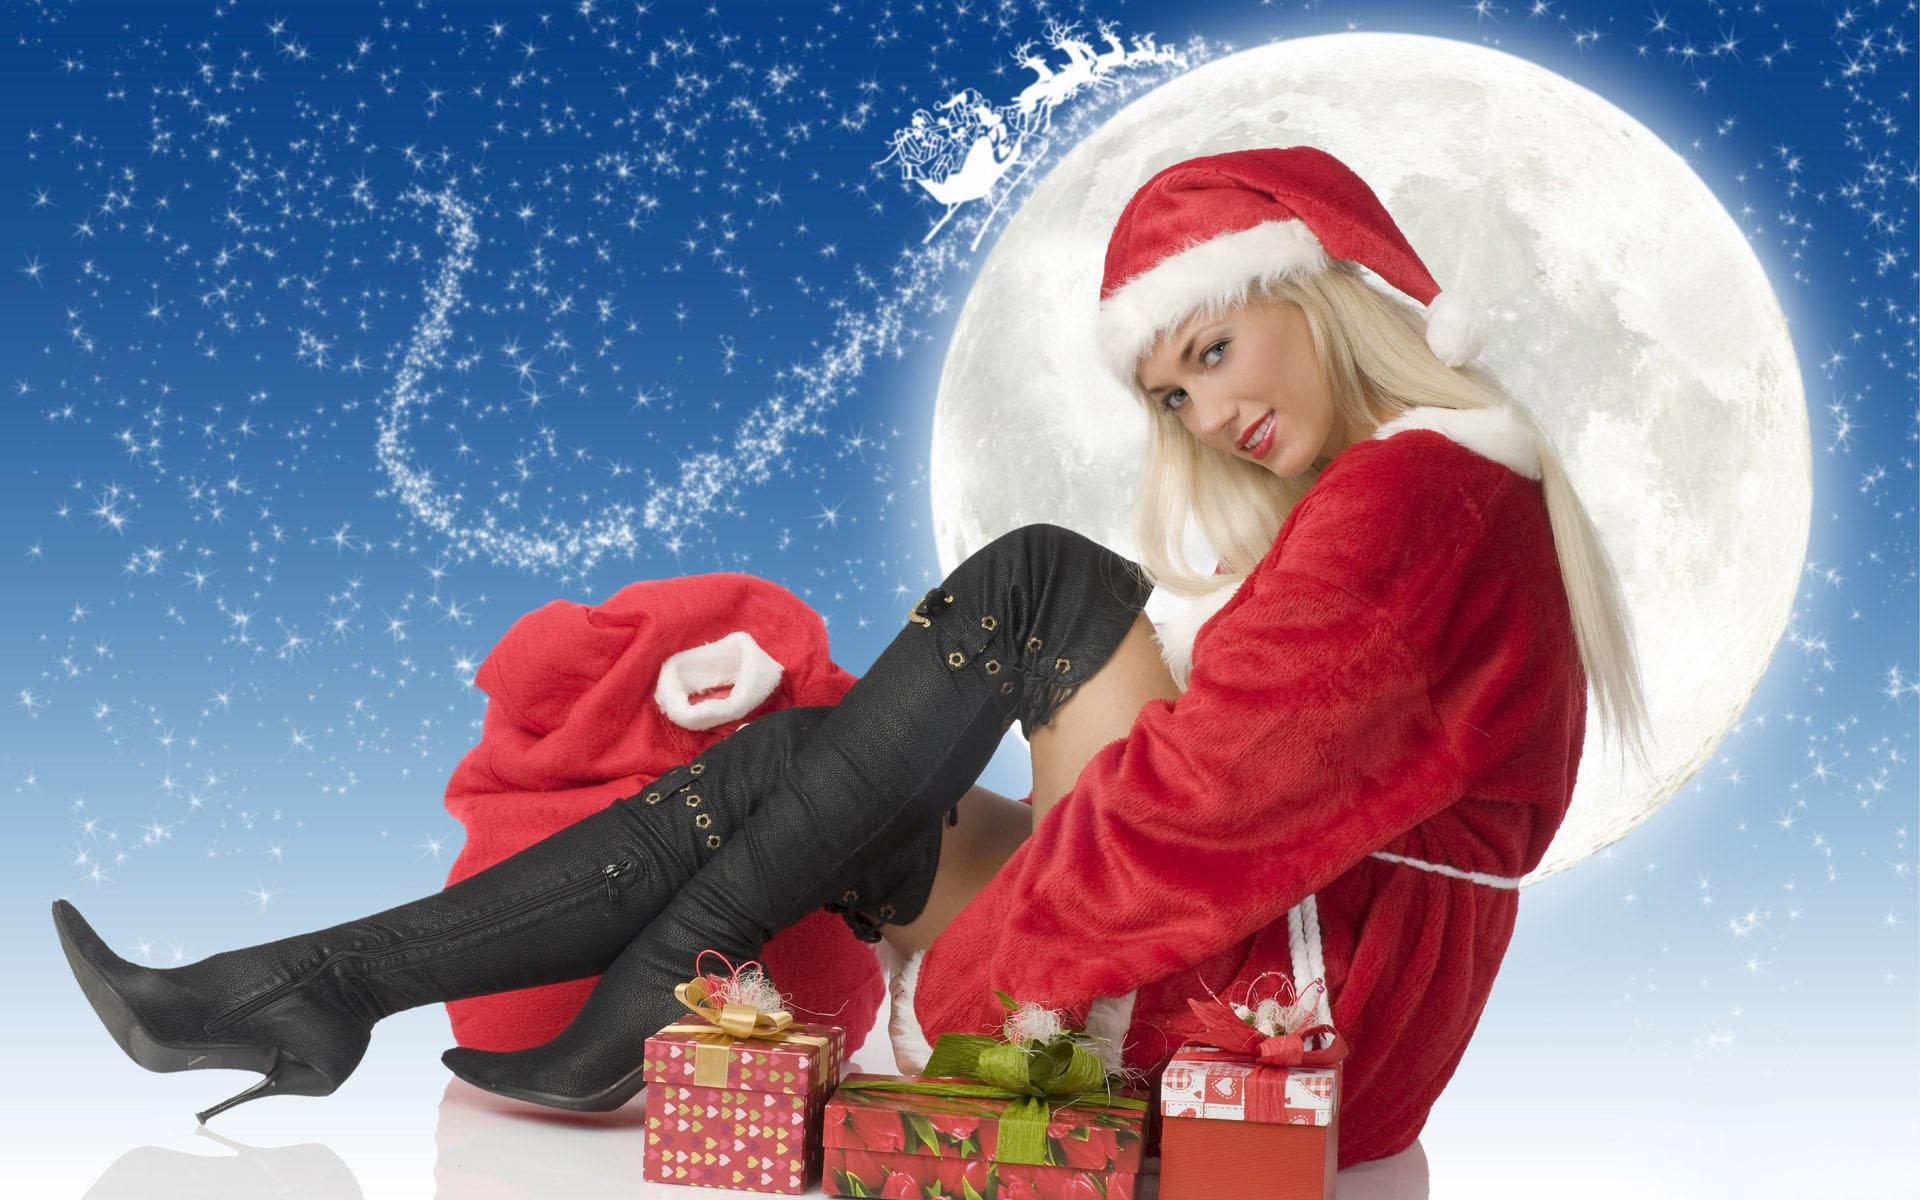 Funny Christmas Wallpaper.74 Funny Christmas Desktop Backgrounds On Wallpapersafari